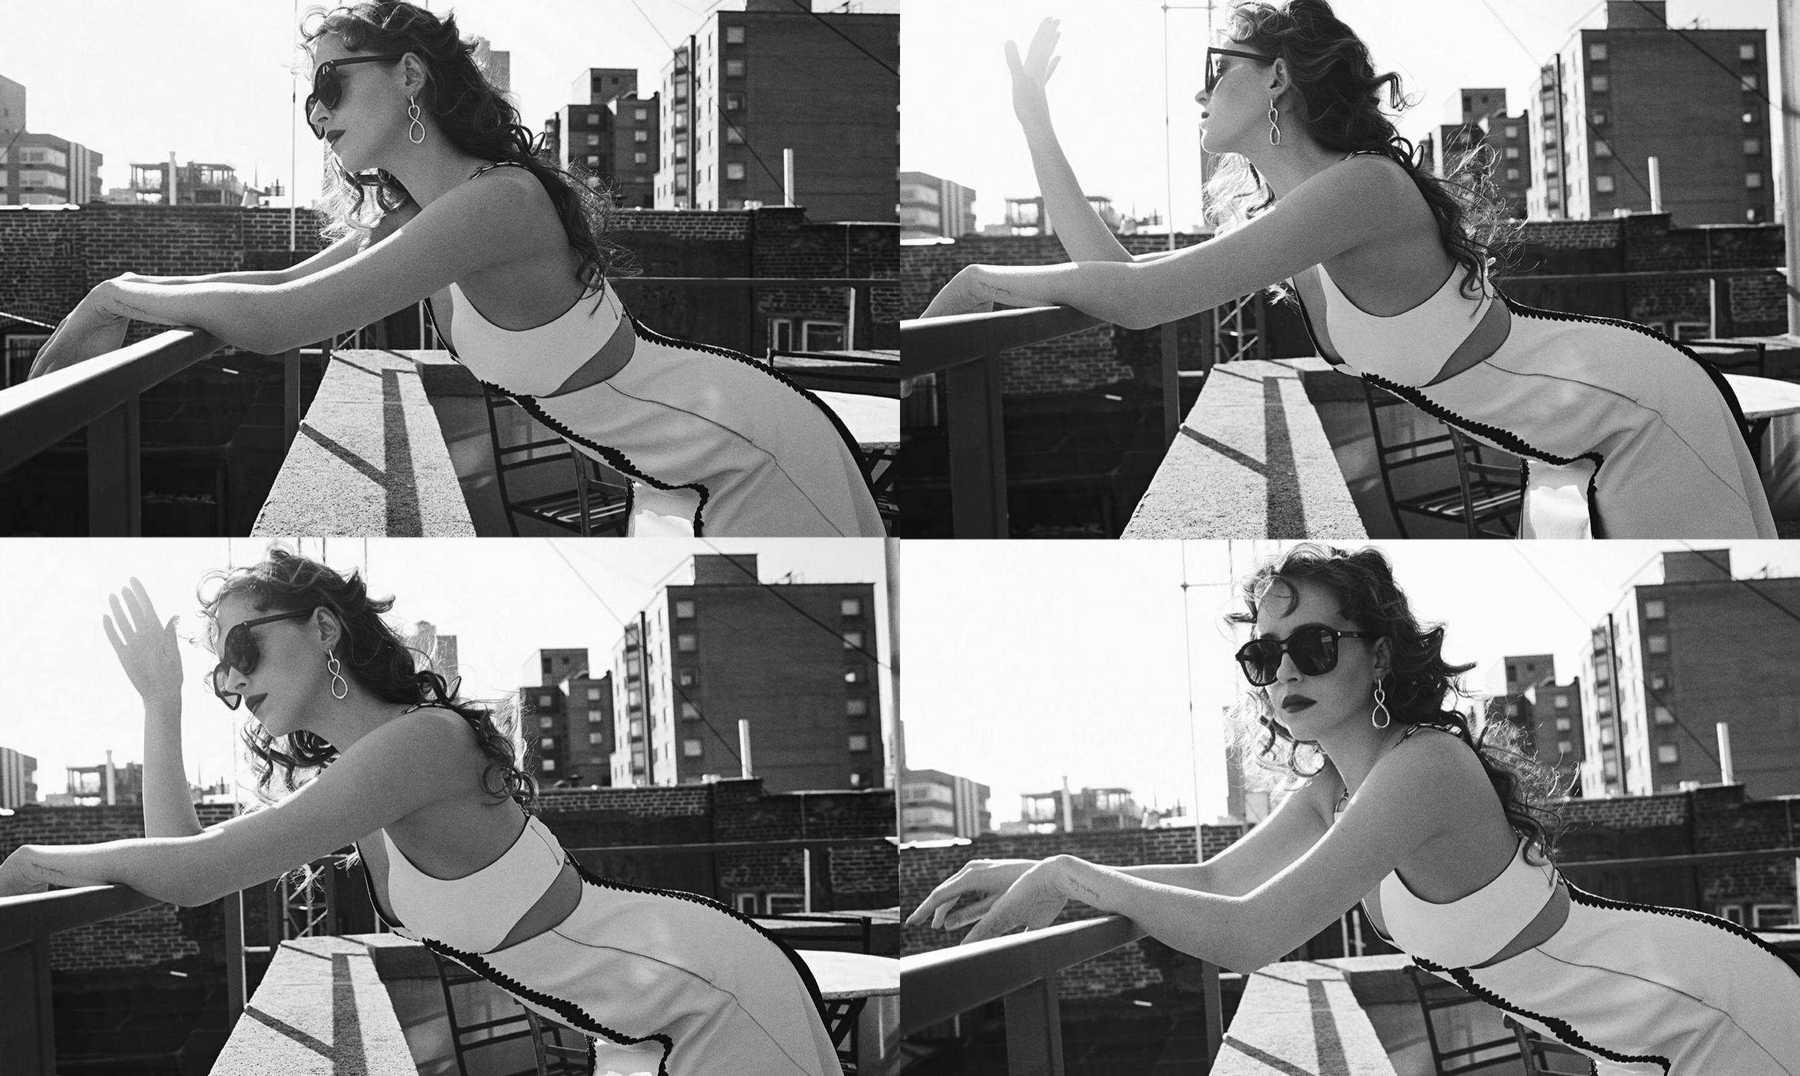 Dakota-Johnson-Emma-Summerton-Photoshoot-for-Vogue-Australia-October-2018d45a22983482594.jpg